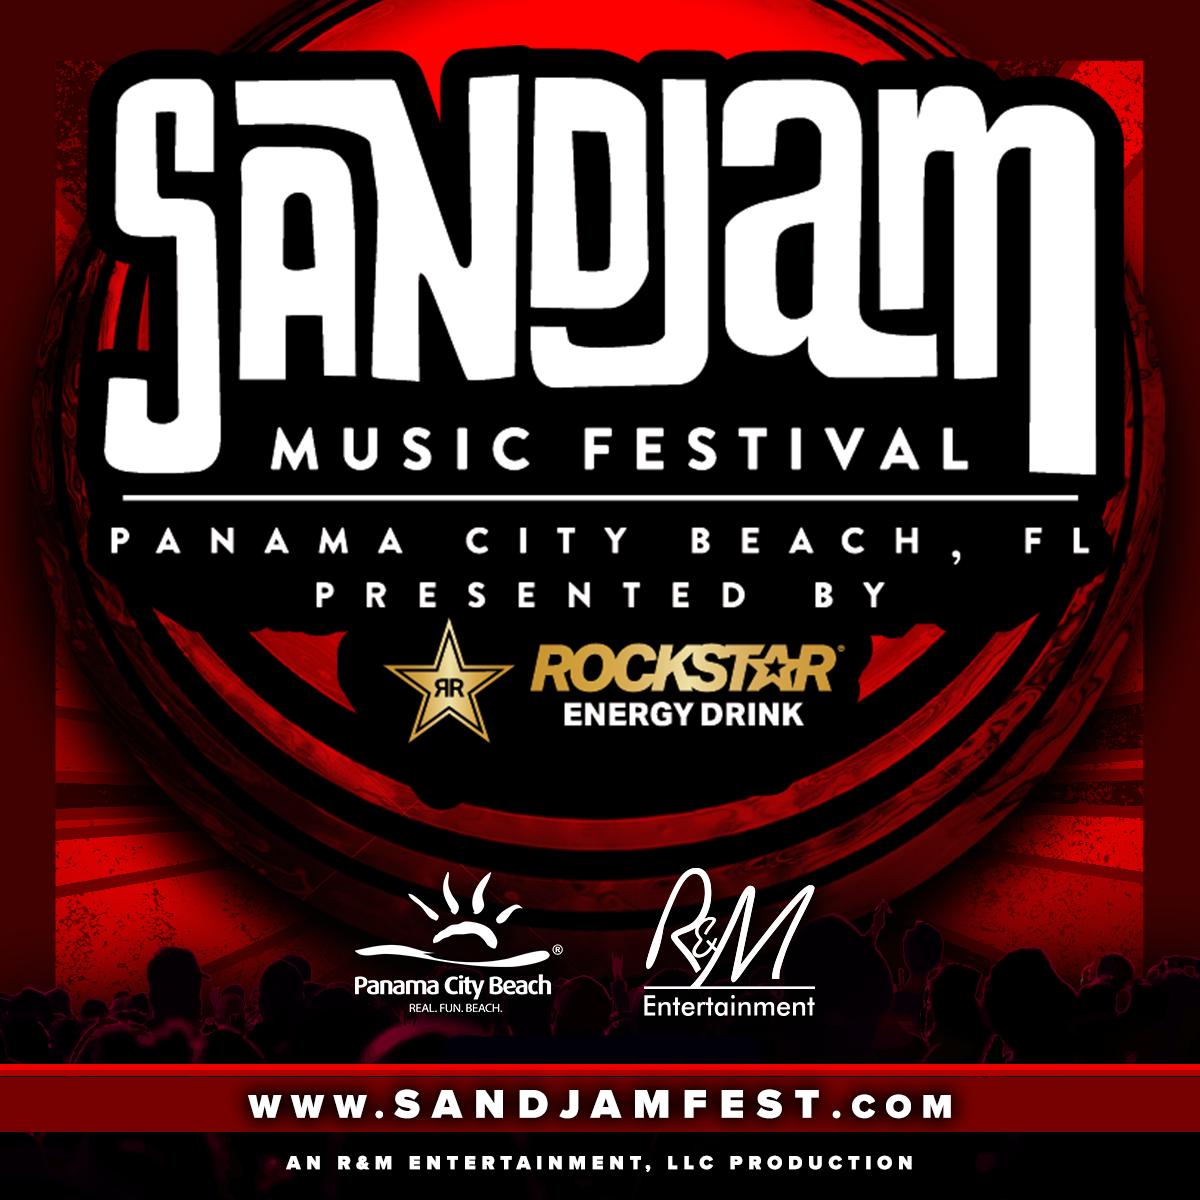 2021 SandJam Music Festival Presented by Rockstar Energy Drink Moving to 2022